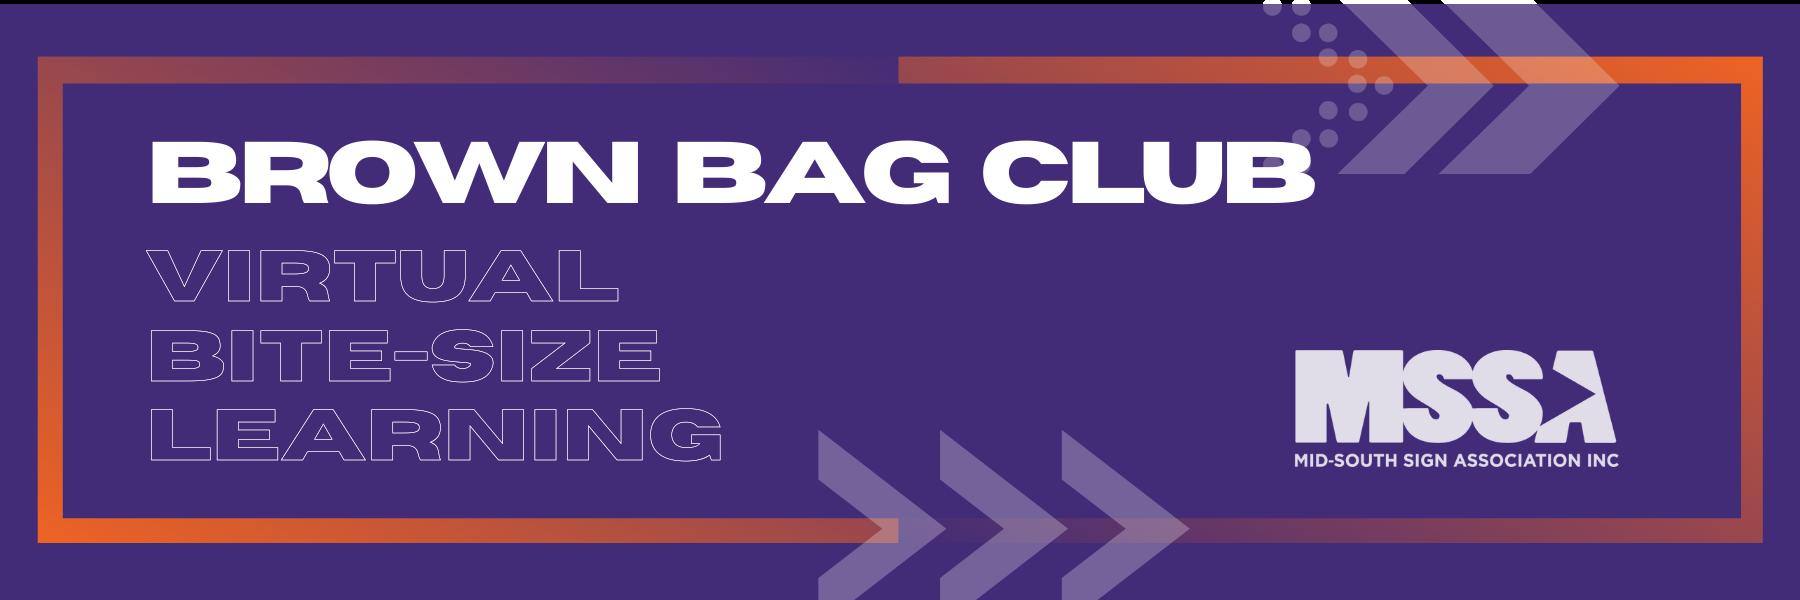 Brown Bag Club